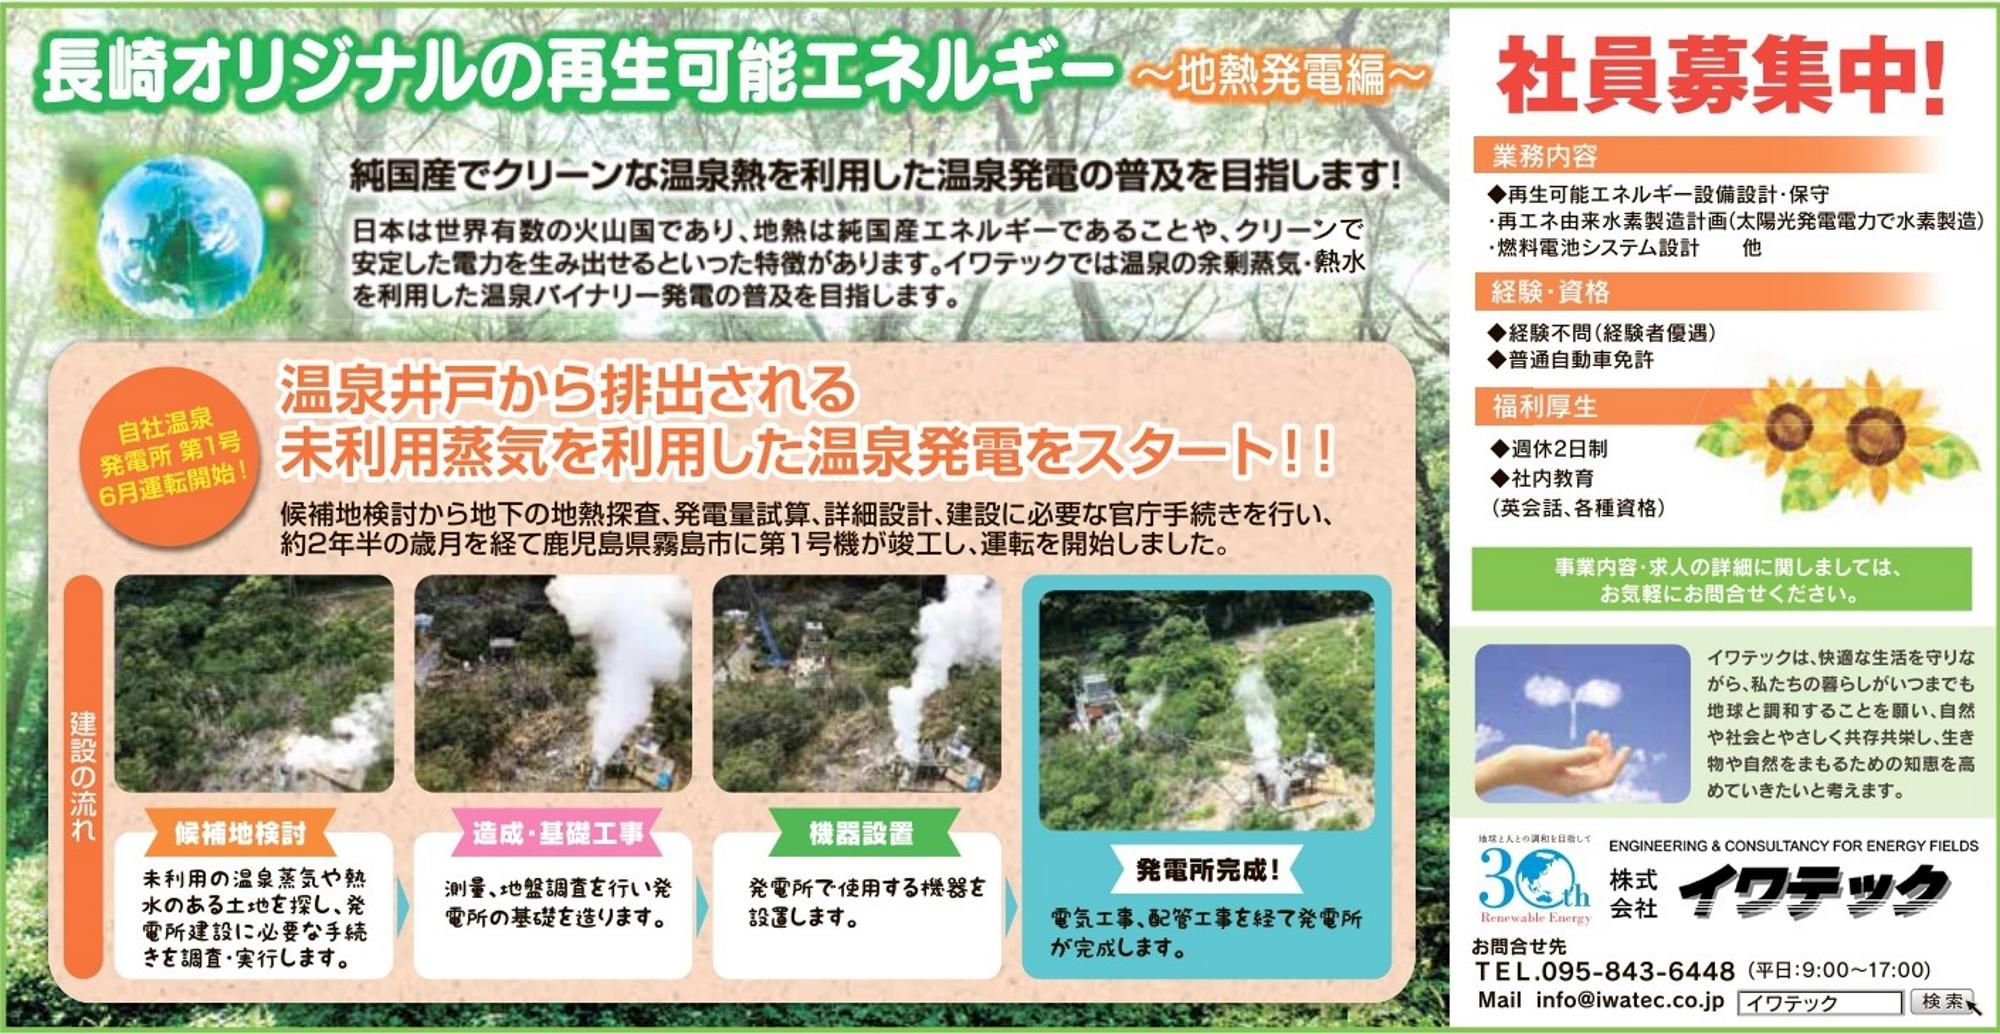 長崎新聞のNR(Nagasaki Reader)夏(7・8月)号広告掲載!